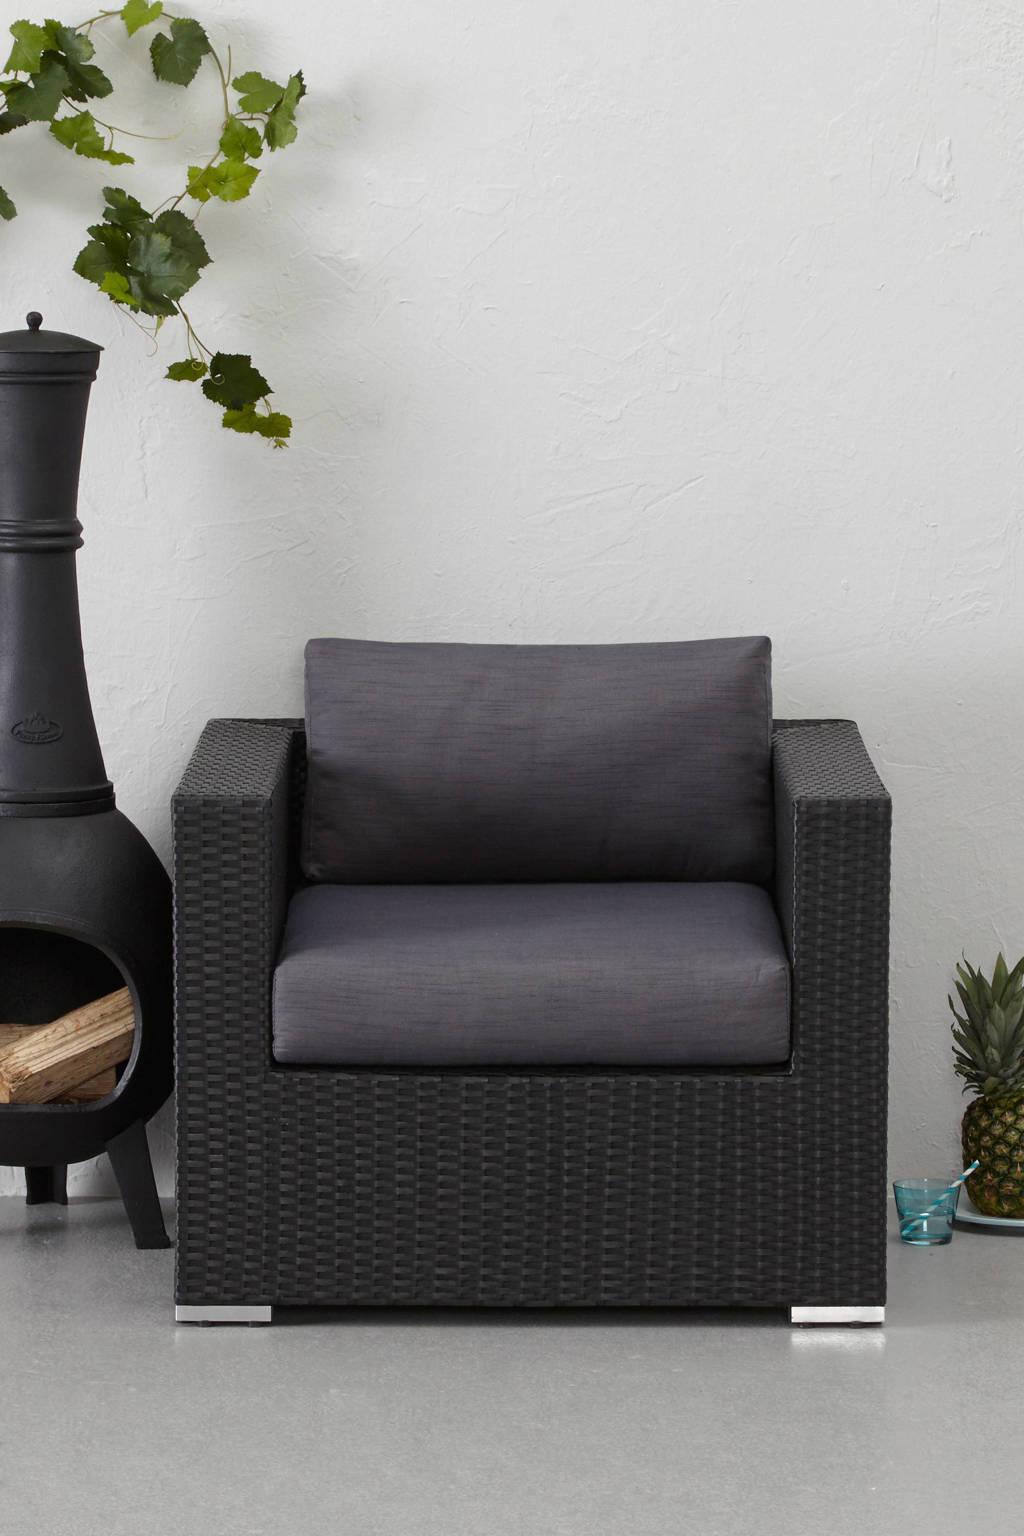 whkmp's own fauteuil St. Tropez (gratis extra hoezenset), Zwart